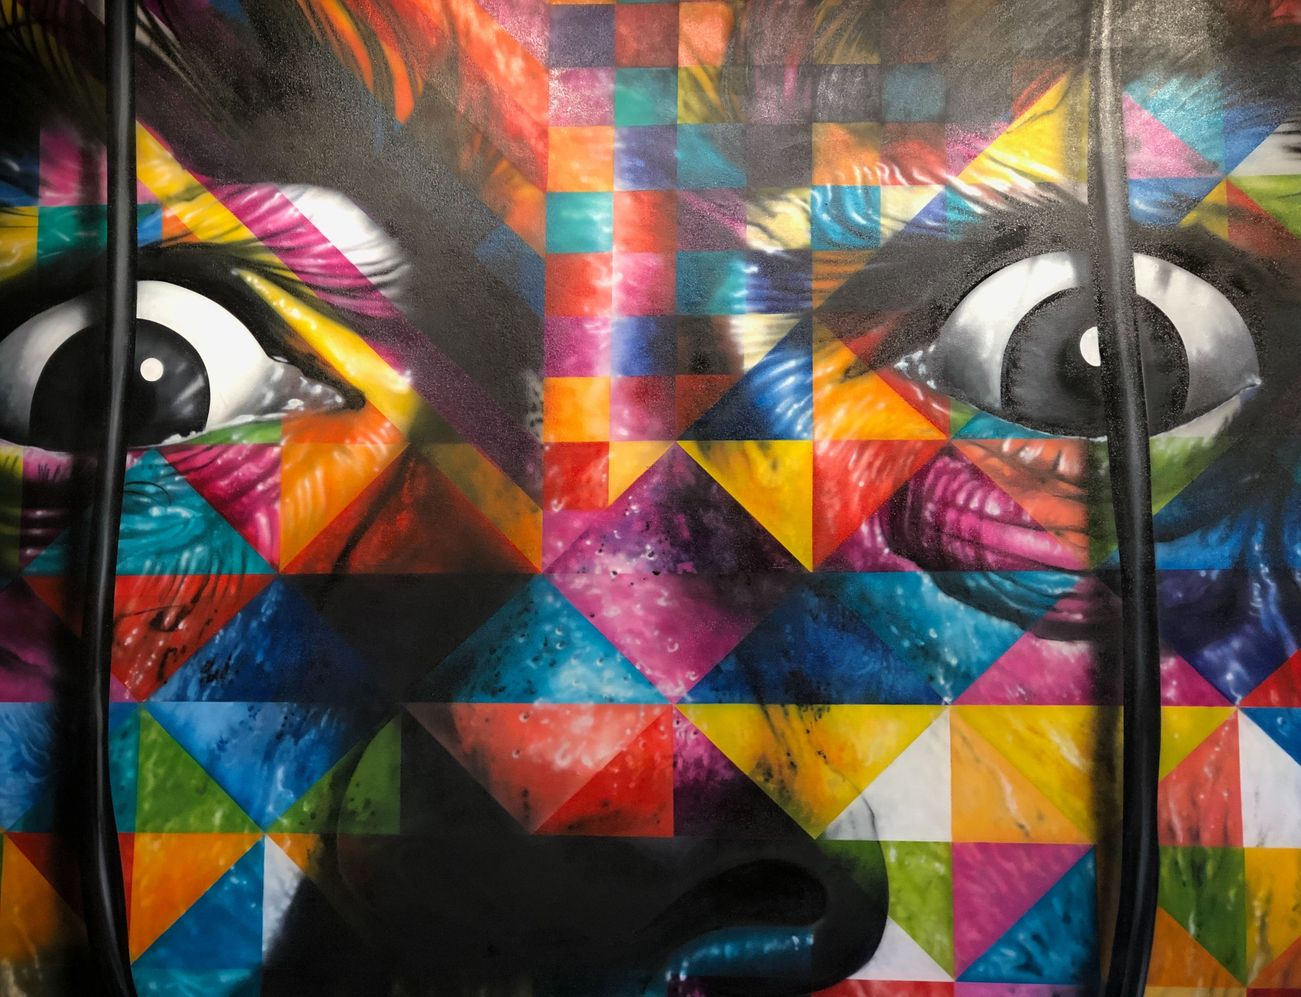 Mosaic art of woman's eyes